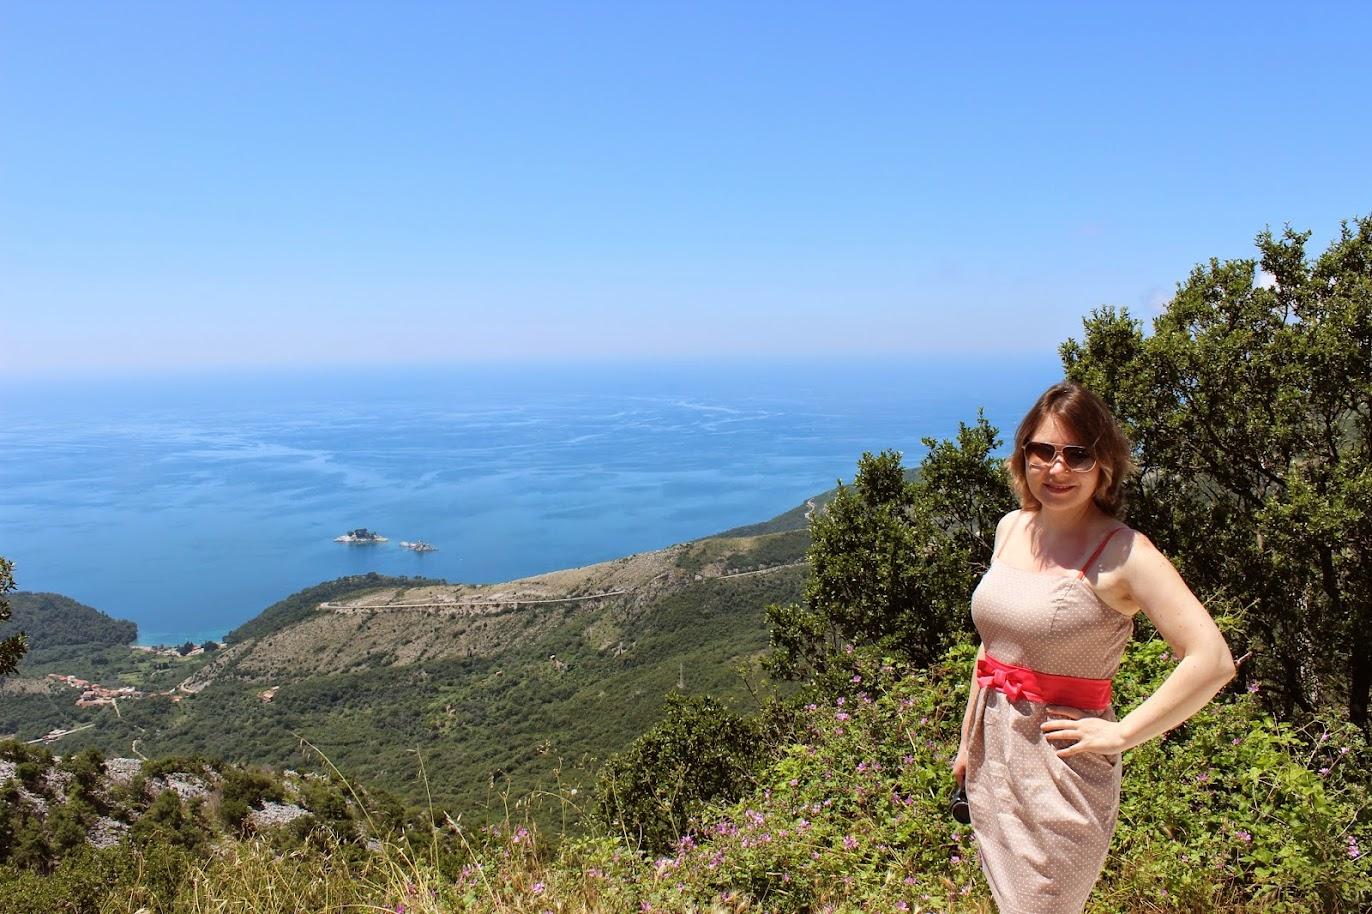 Вид на море с горы над Петровацем